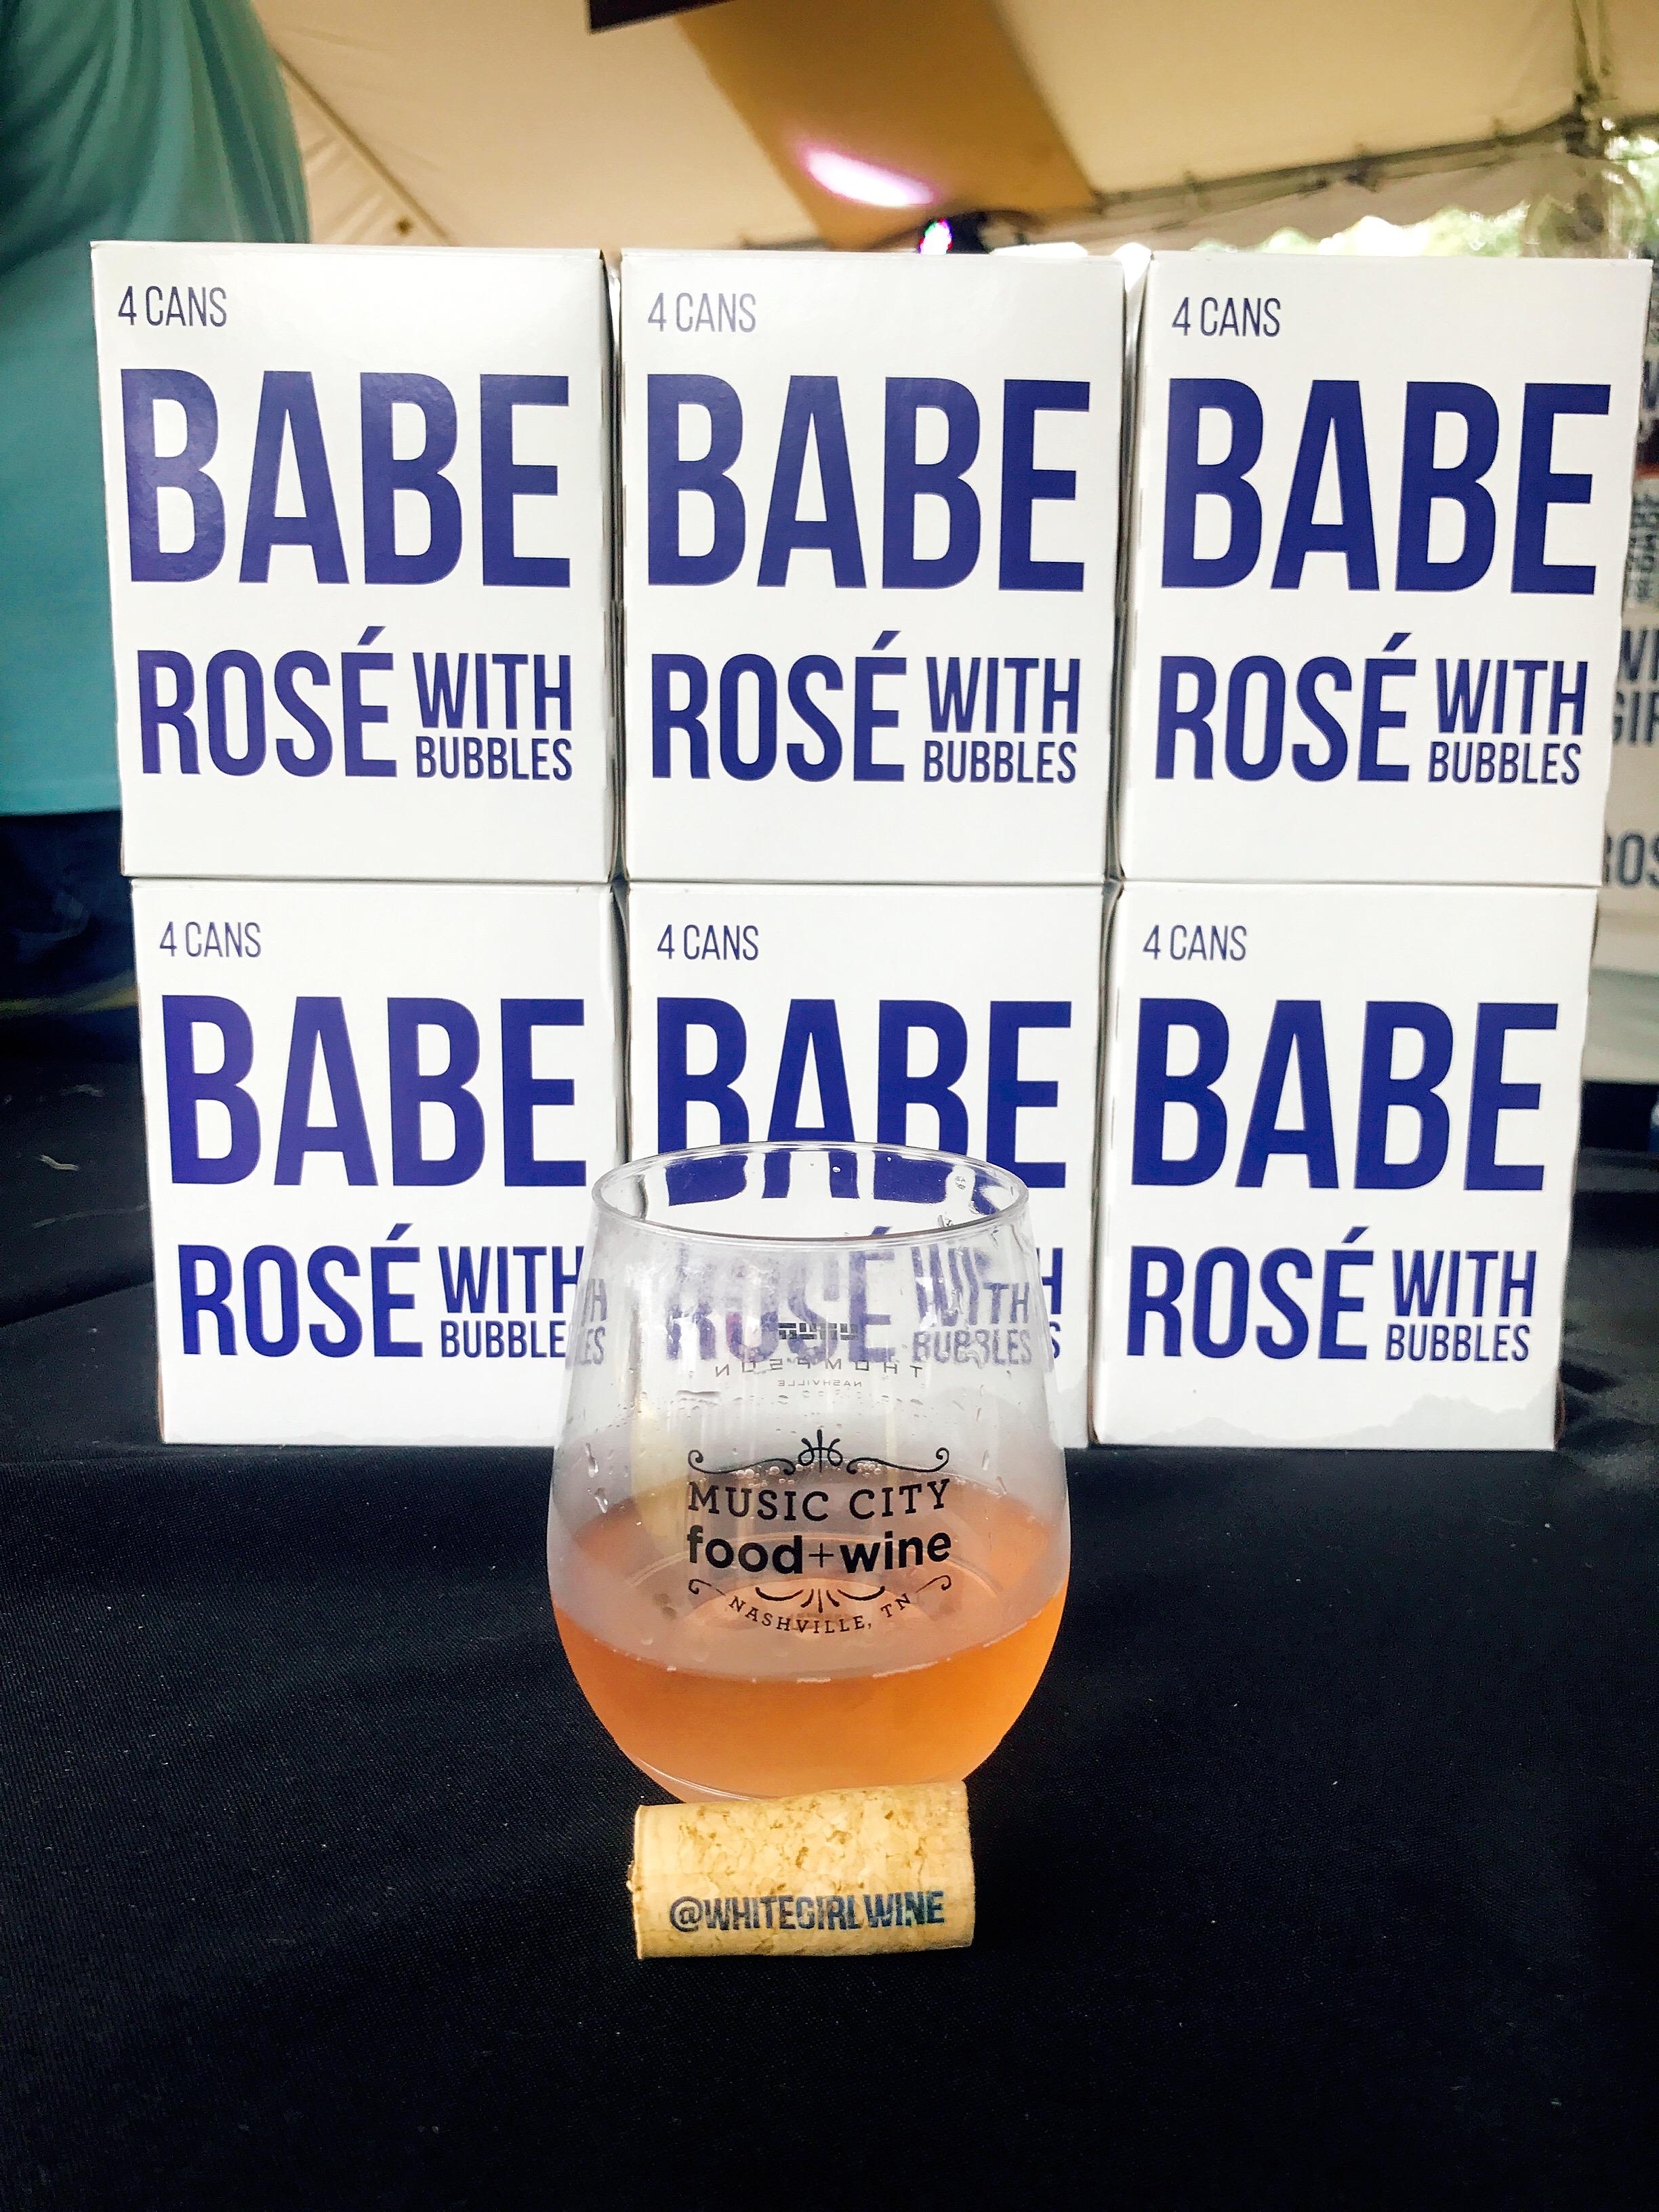 Babe Rosé with Bubbles